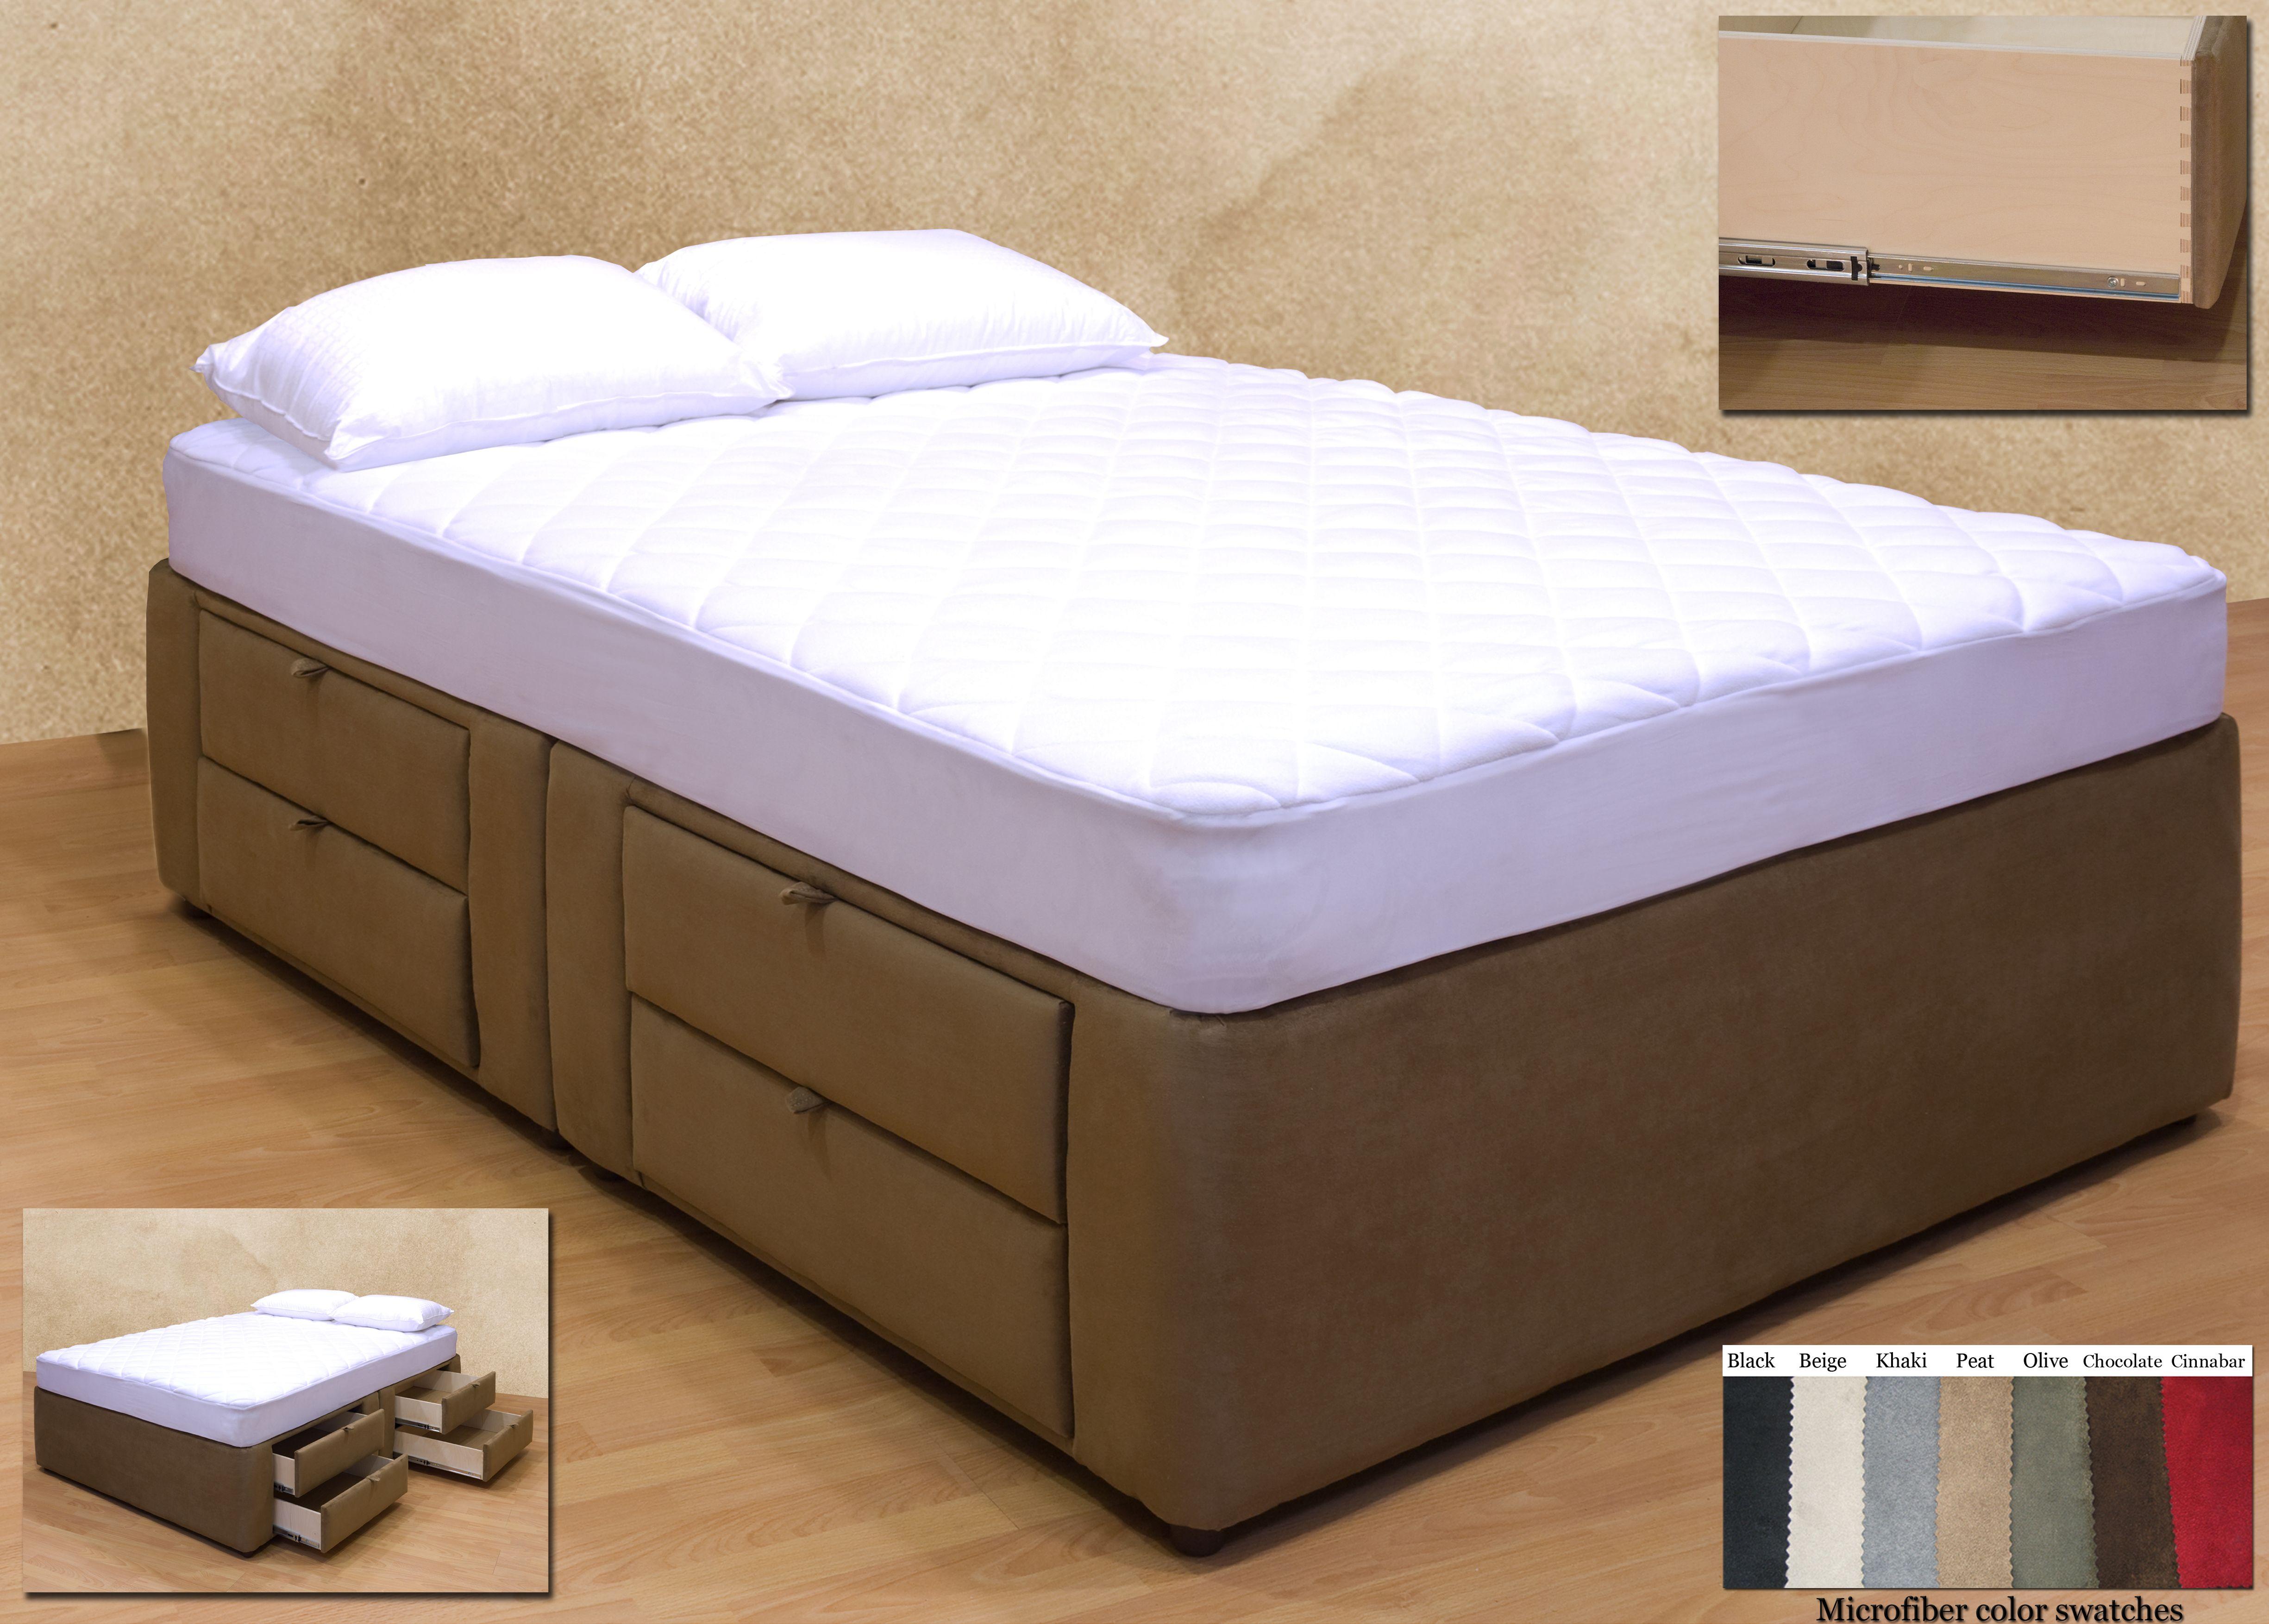 Plattform Bett Mit Open Storage Full Size Bett Rahmen Mit